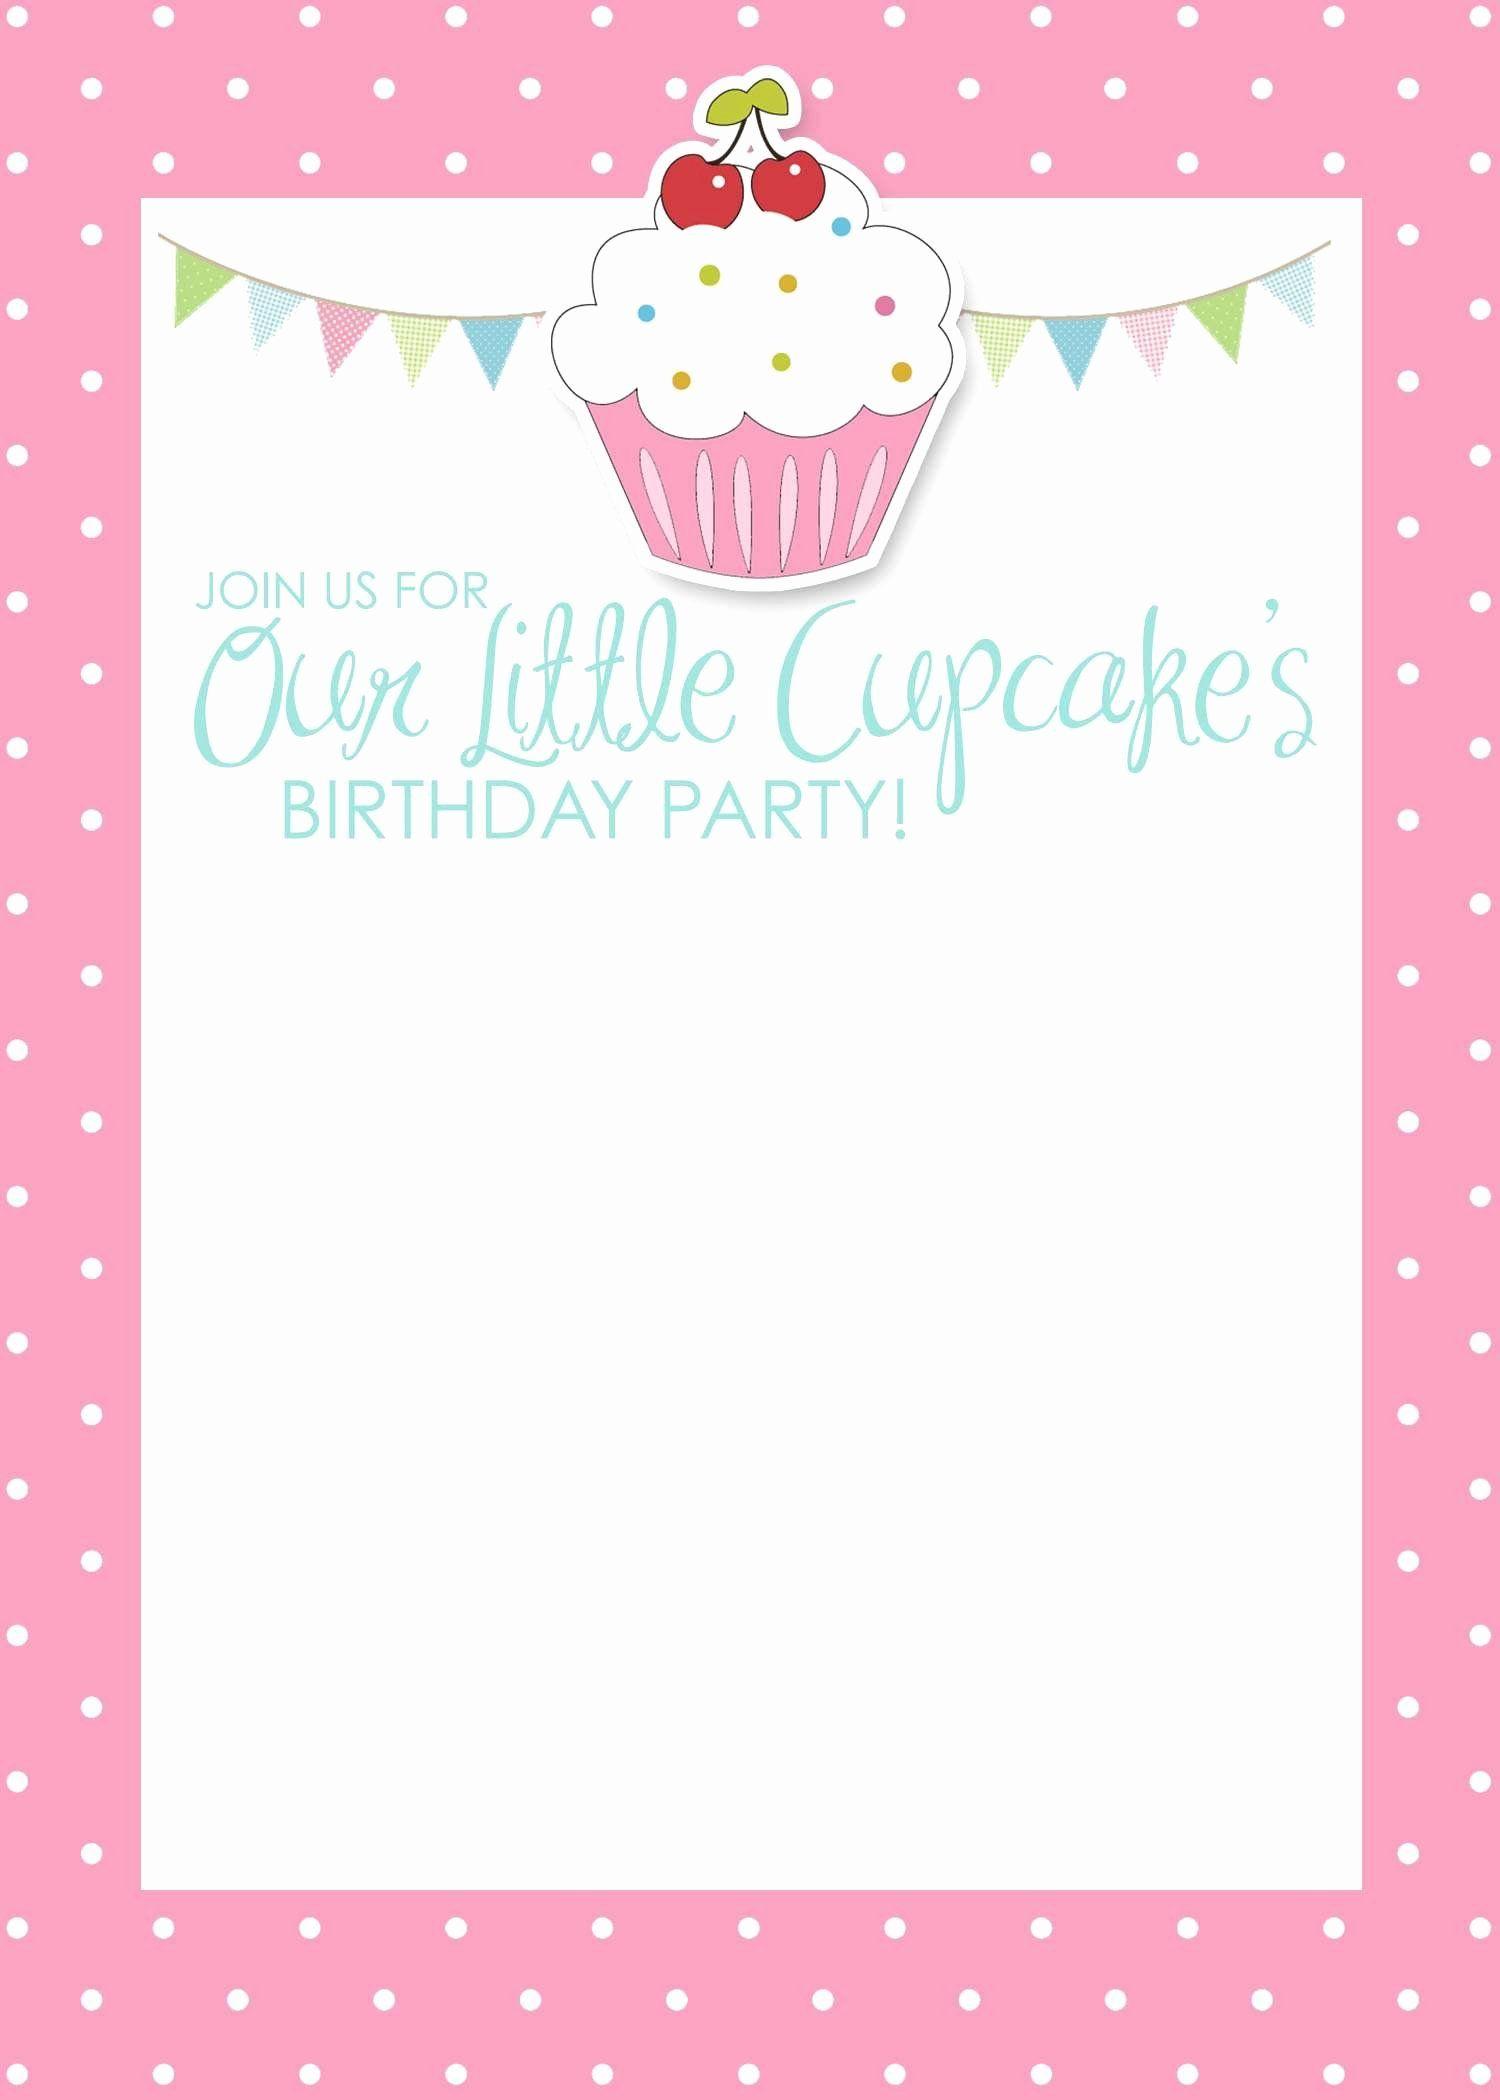 Free Birthday Party Invitation Templates Elegant Birthday Invitation C Invitation Card Birthday Birthday Invitation Card Template Birthday Invitation Templates